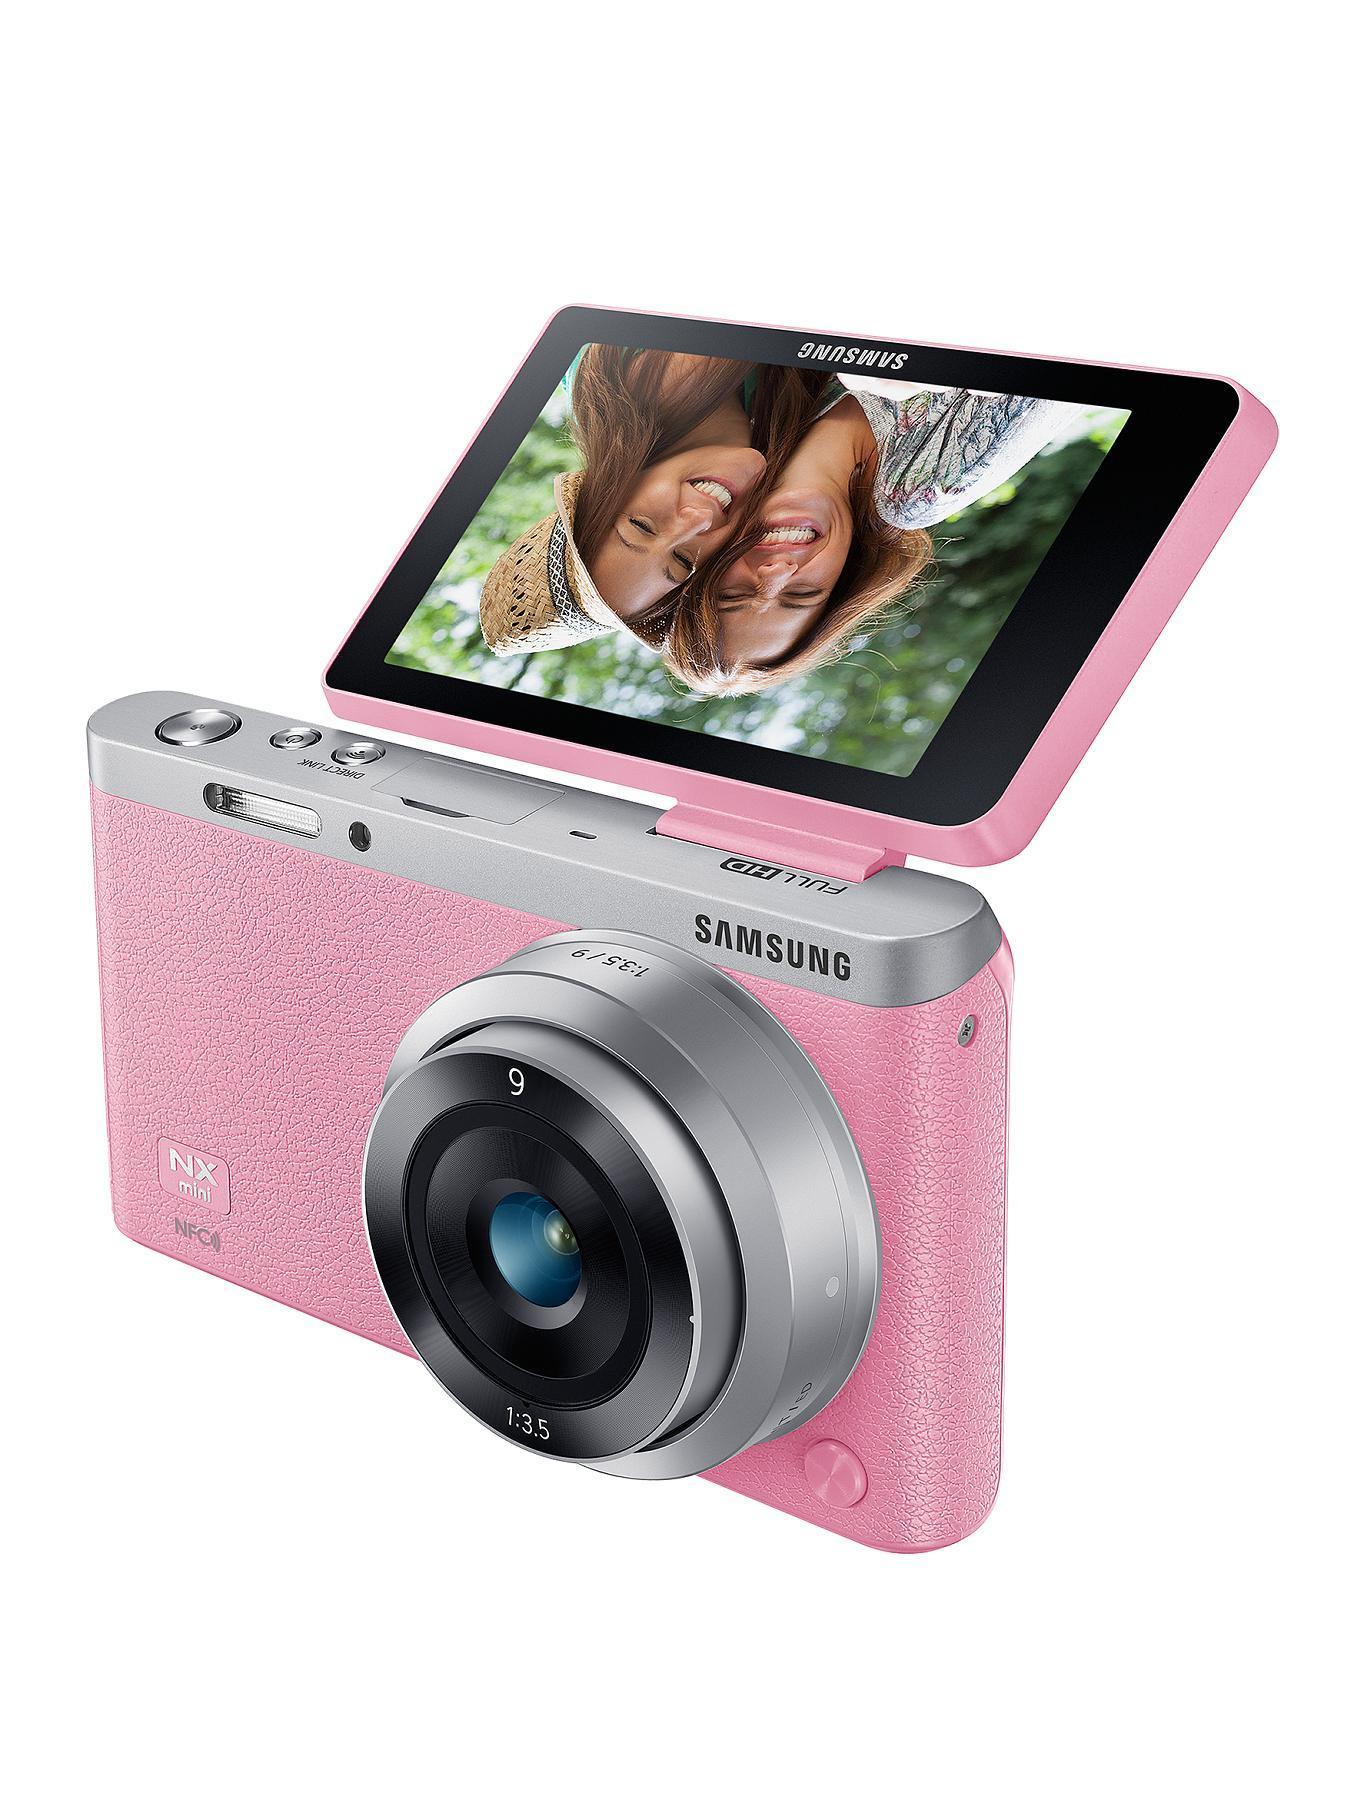 Cellulari fotocamera 5 megapixel prezzi 39